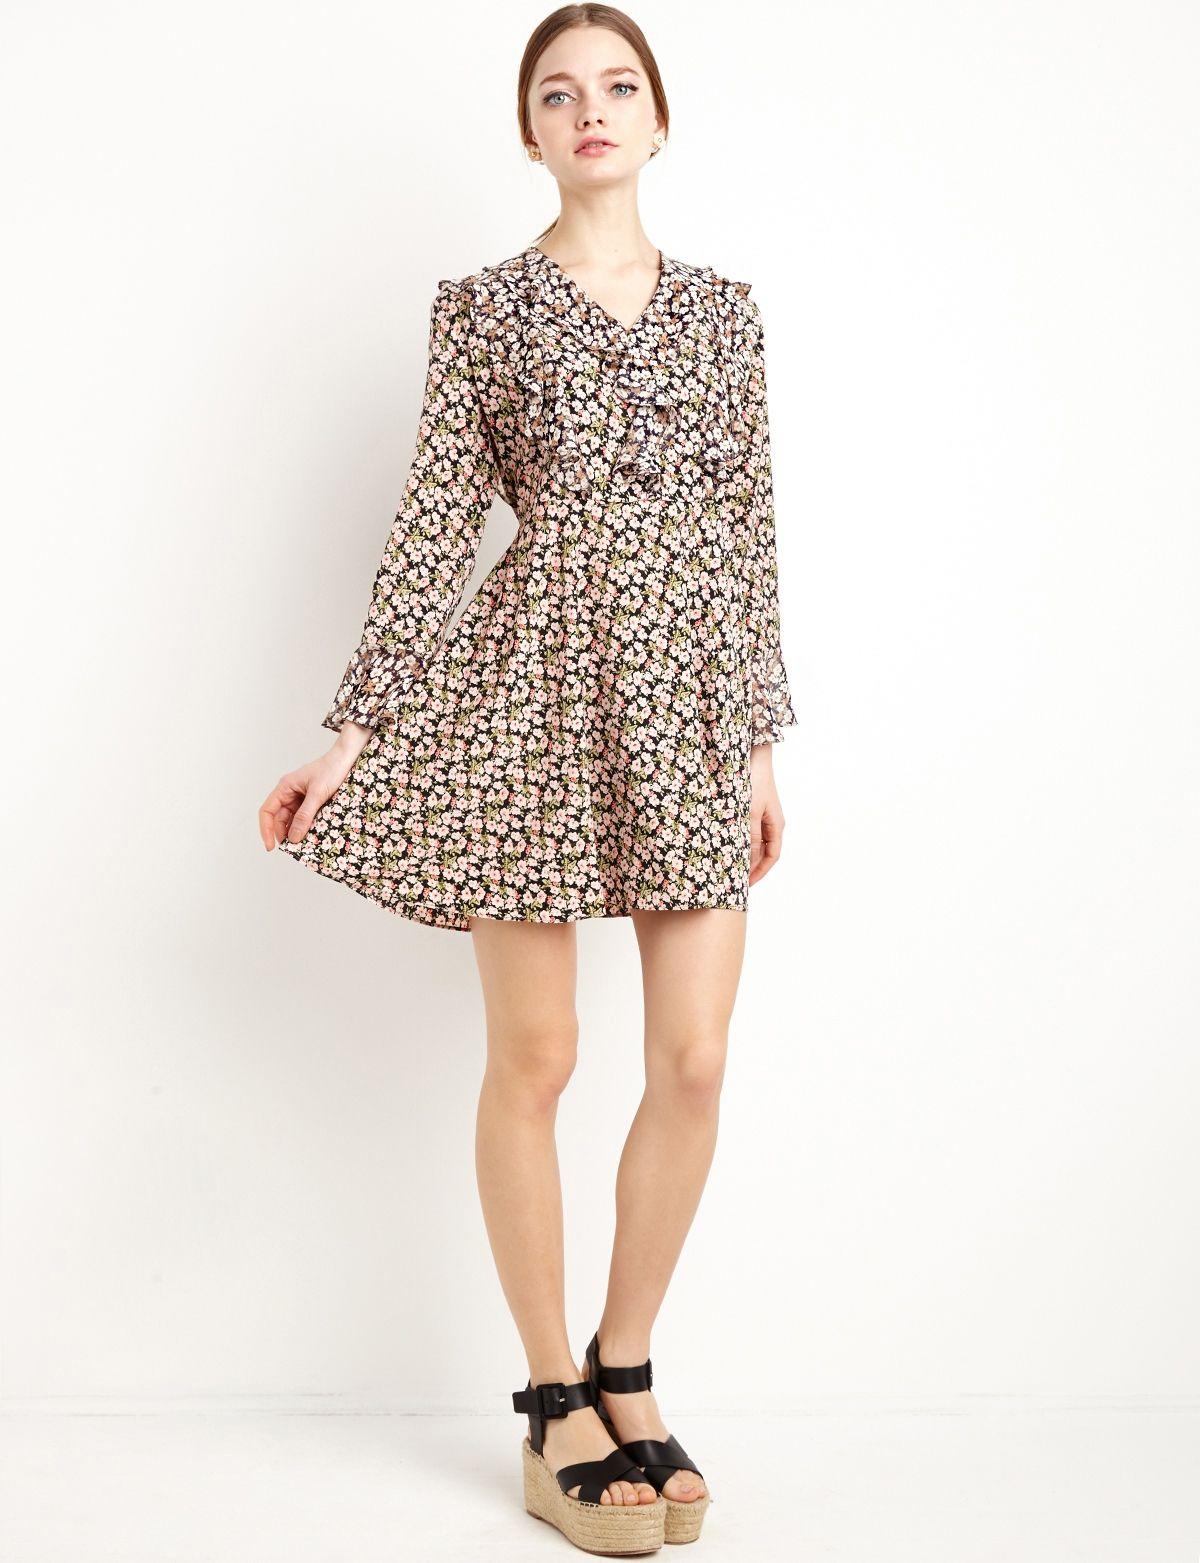 572b3aa5c5d0 Floral Ruffle Dress #fashion #pixiemarket   New Arrivals   Dresses ...